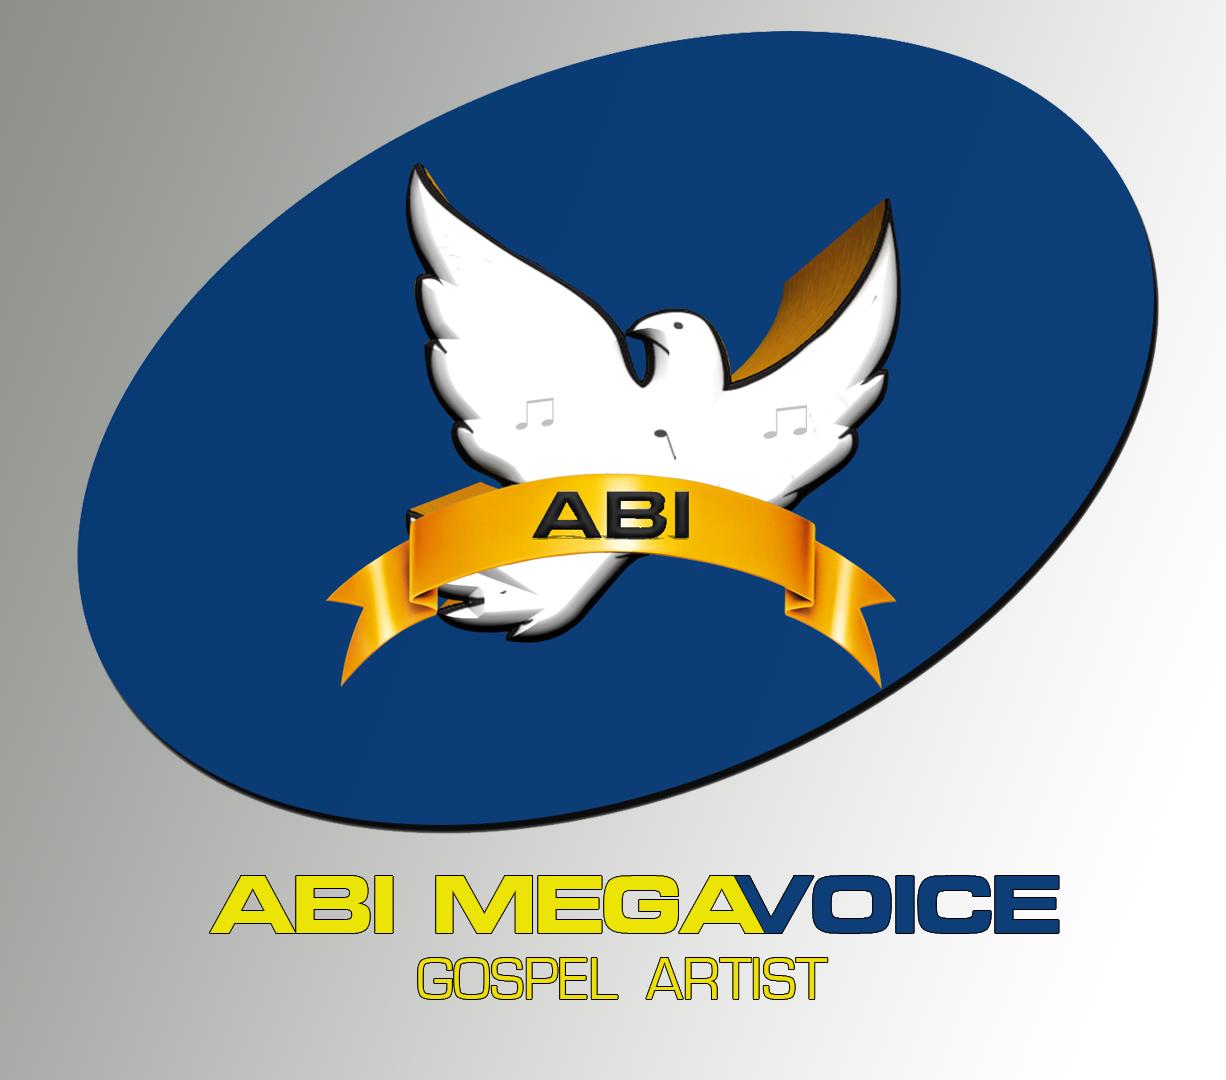 ABI MEGAVOICE GOSPEL ARTIST